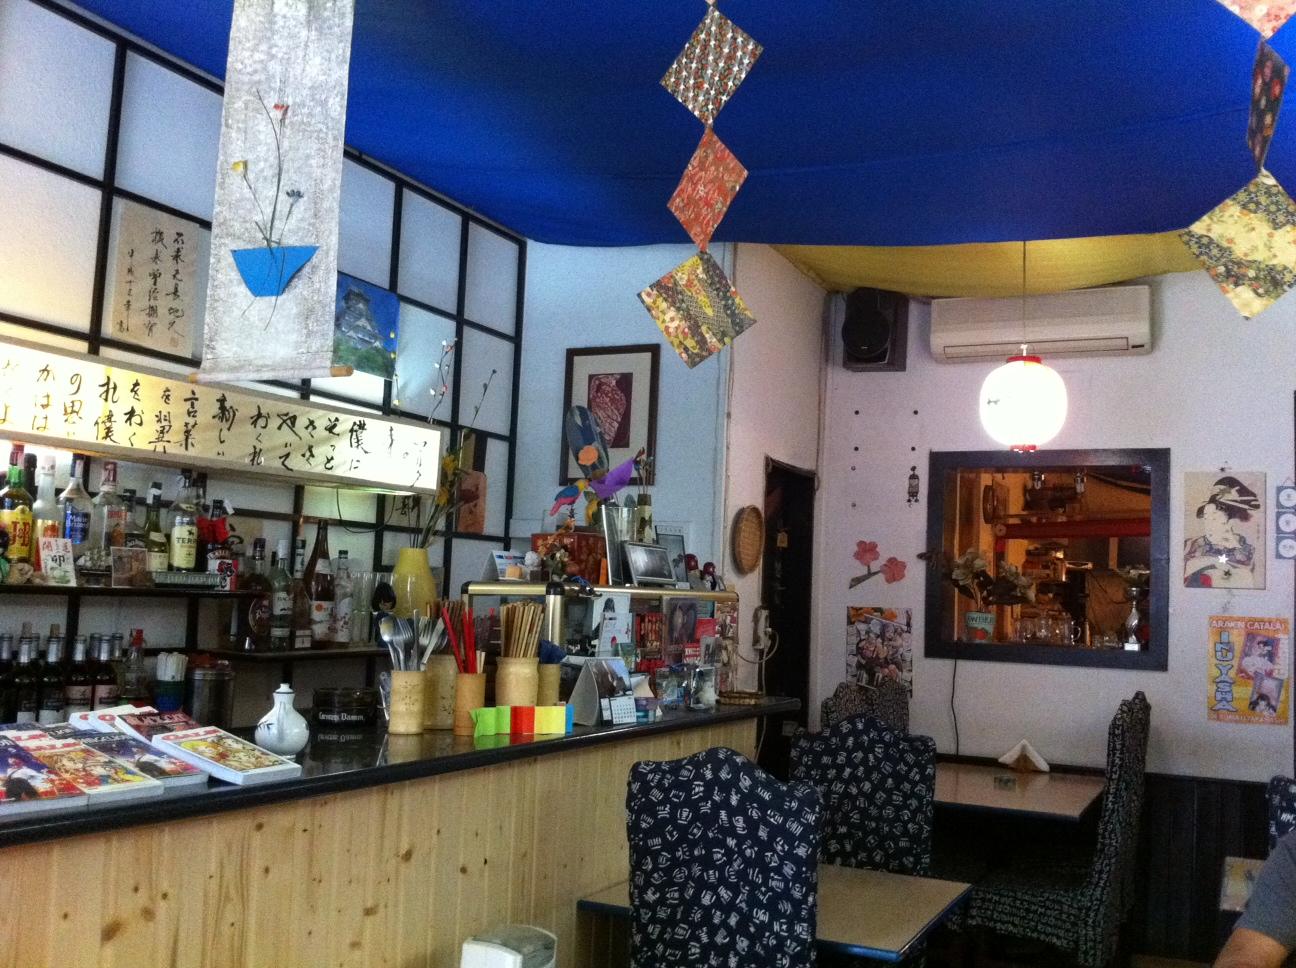 Terrific Asagaya Amb Te Japones O Cafe Gratis Per A Bbbb Bbbb Home Interior And Landscaping Pimpapssignezvosmurscom